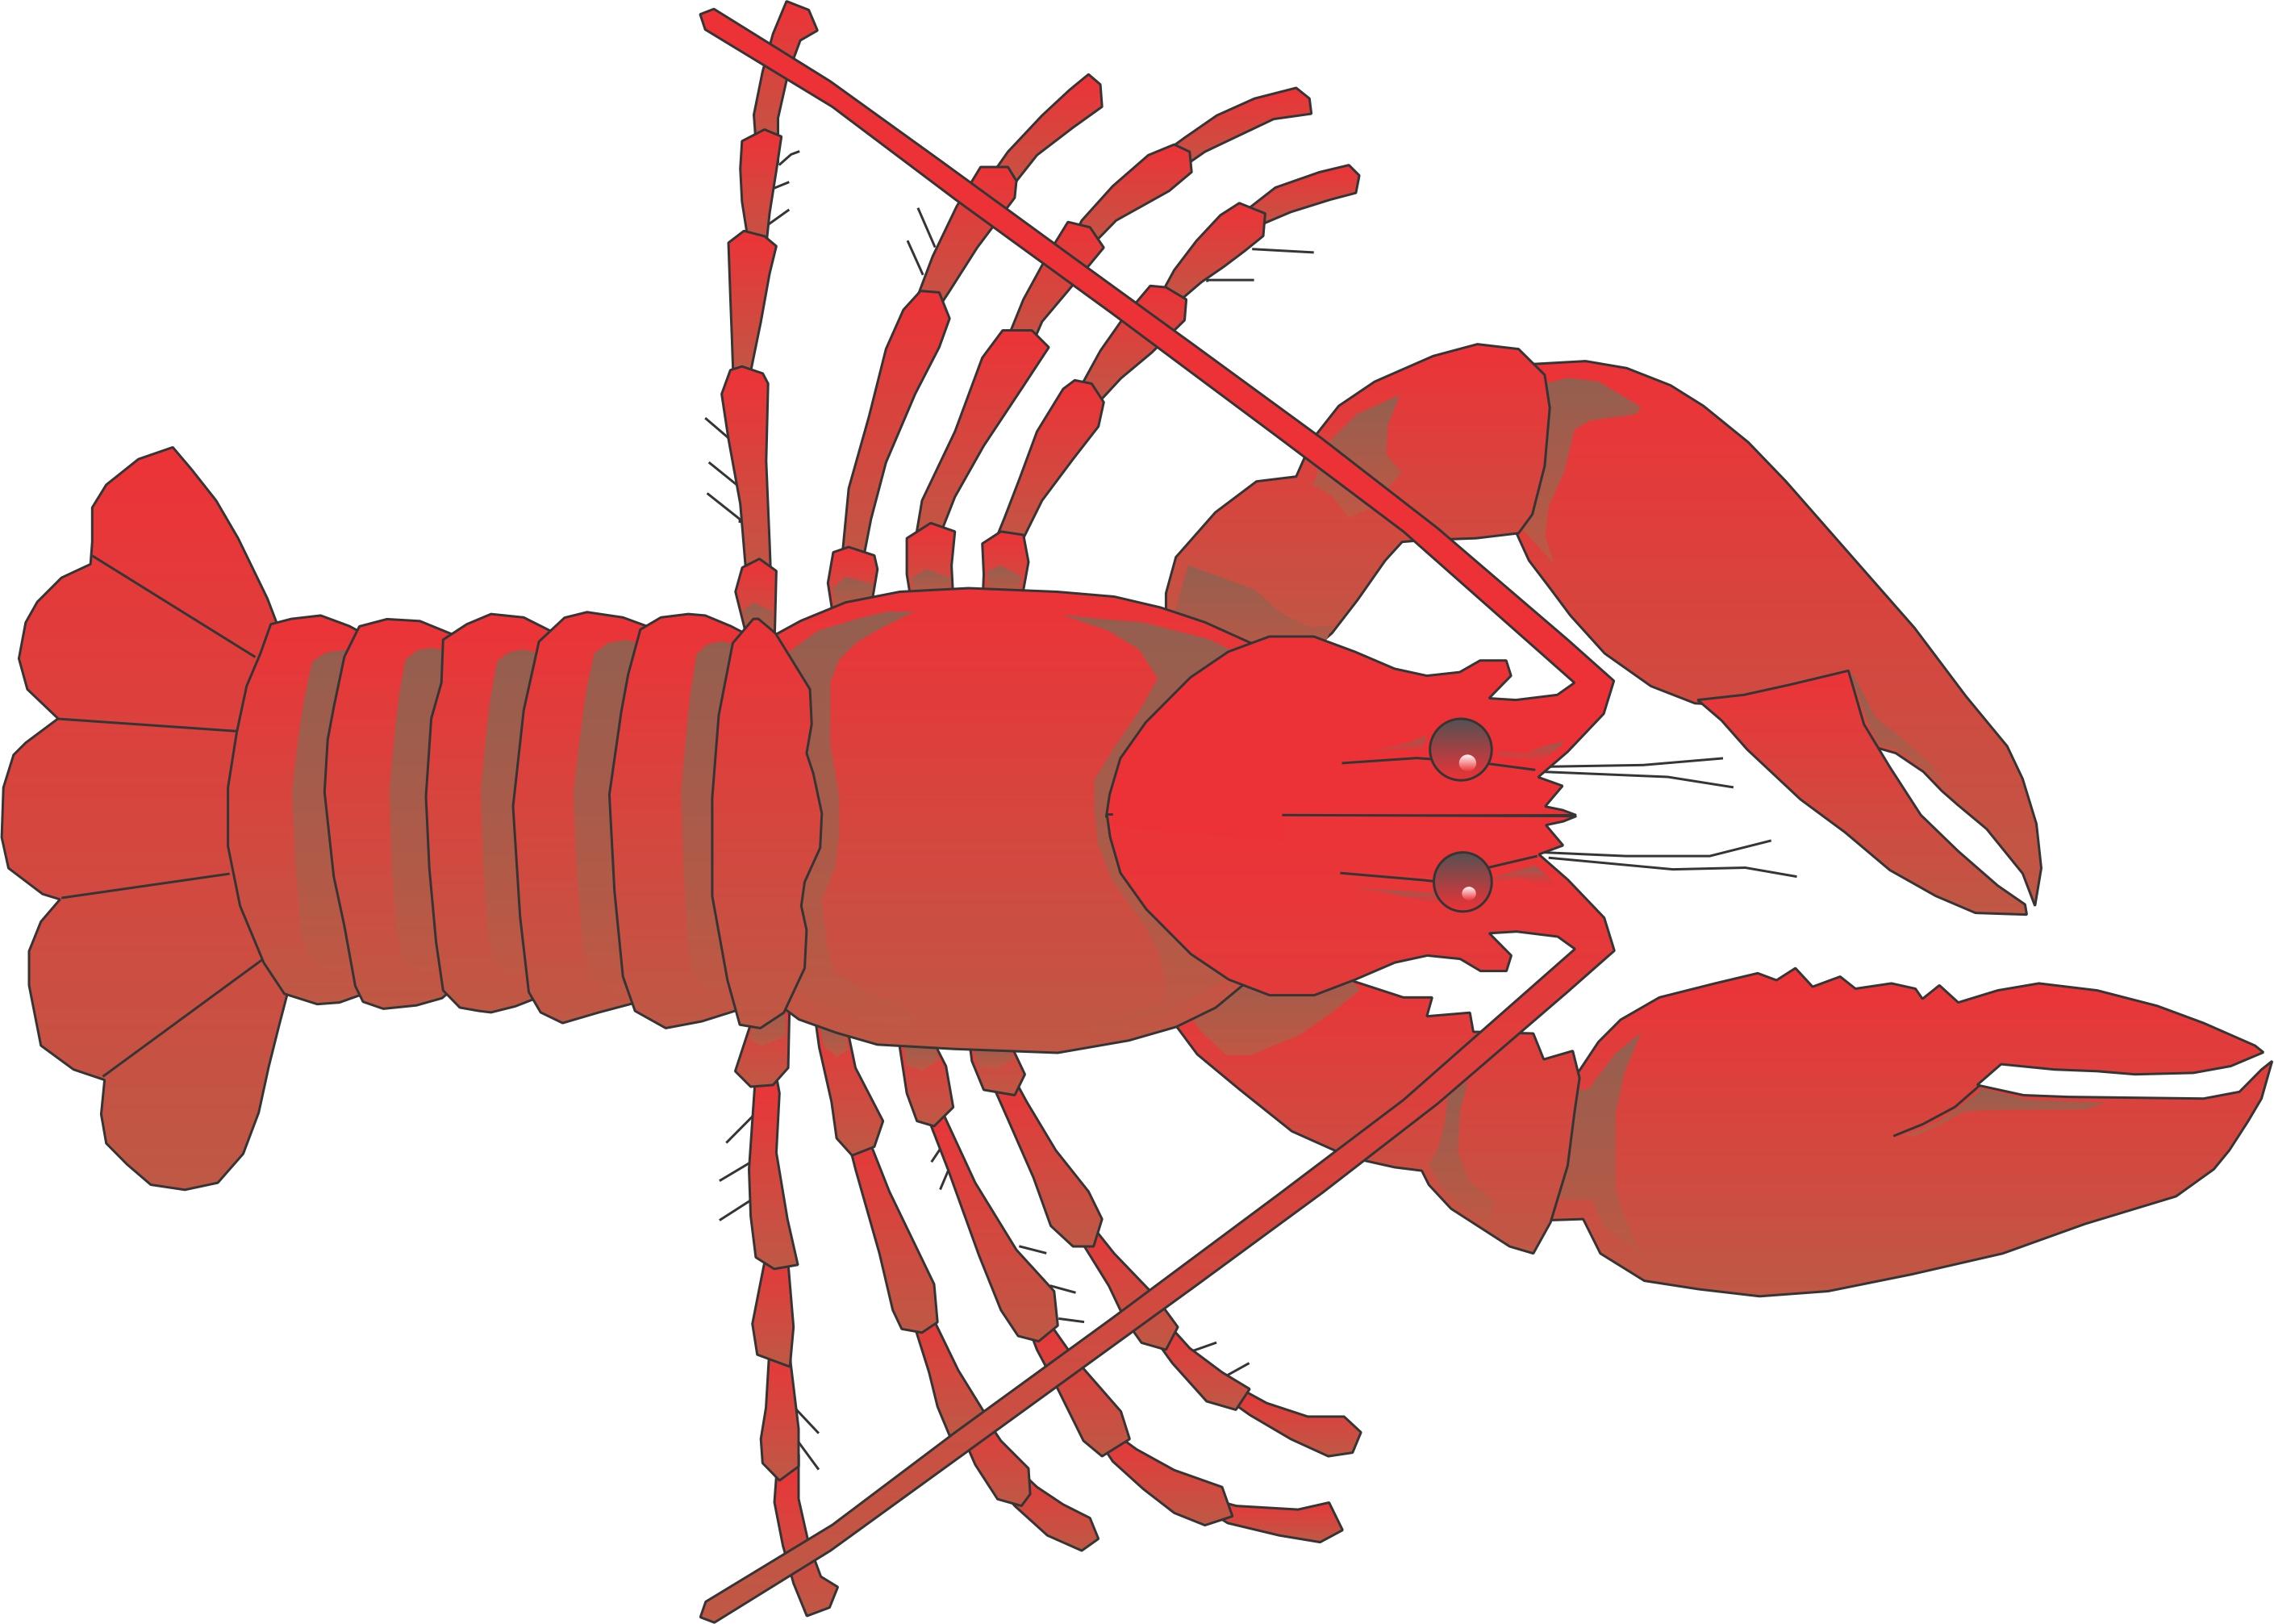 Lobster outline clipart 4